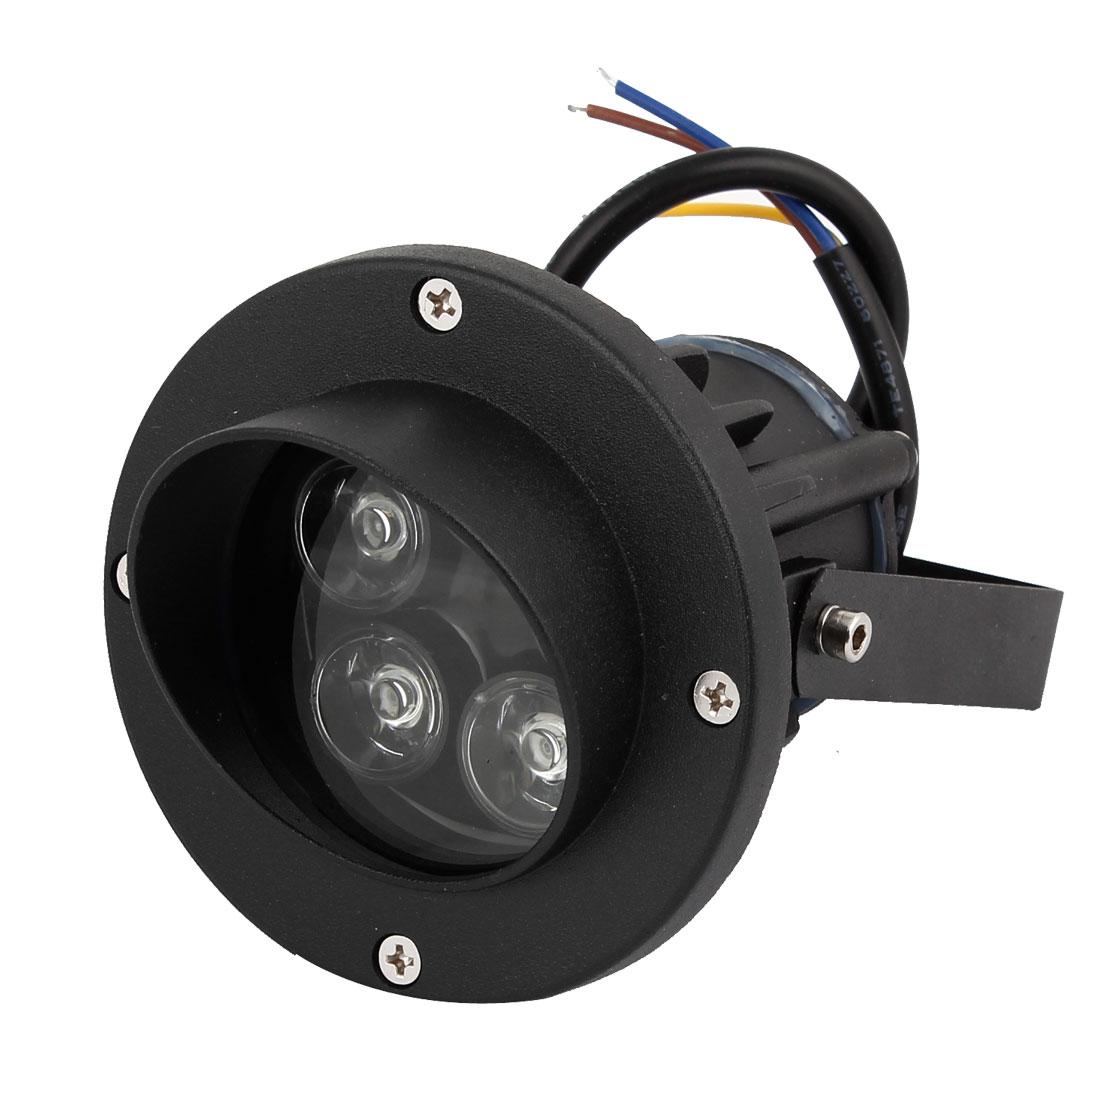 AC85-265V 5W Blue LED Light Wall Outdoor Yard Path Garden Spotlight Lamp